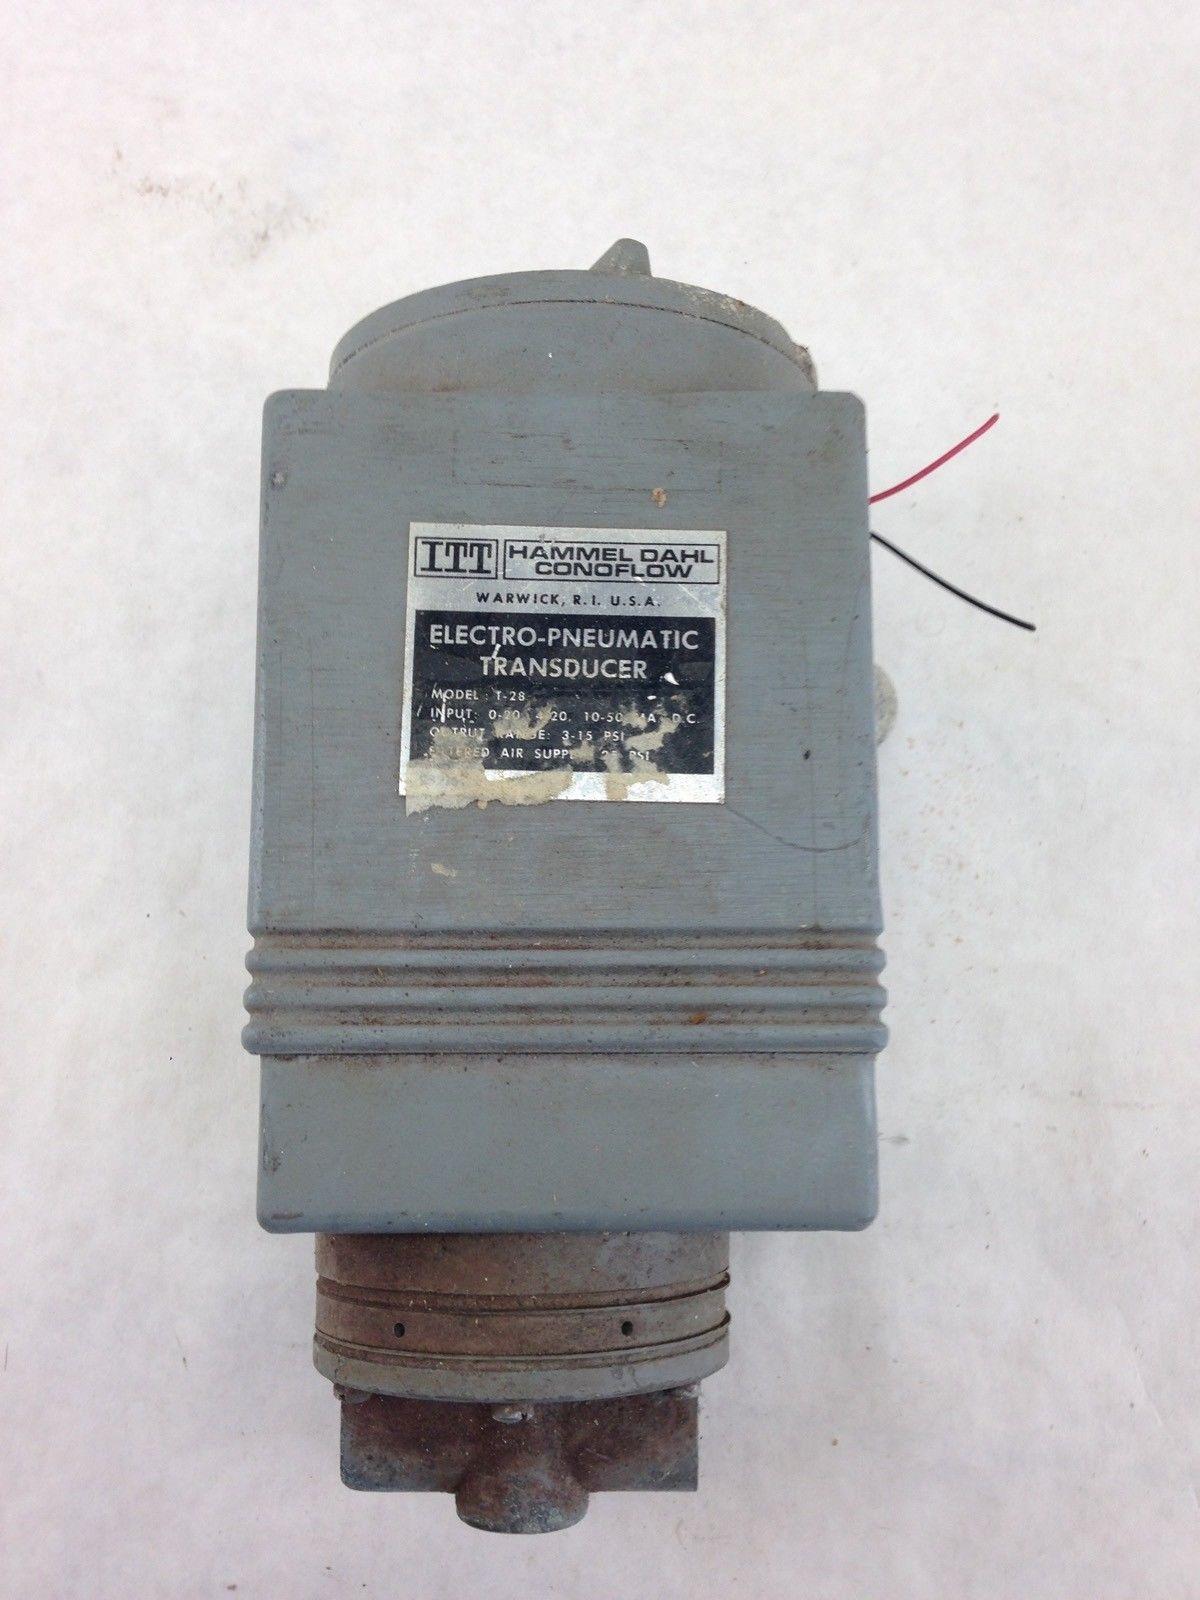 HAMMEL DAHL CONOFLOW T-28 ELECTRO-PNEMATIC TRANSDUCER (B443) 1